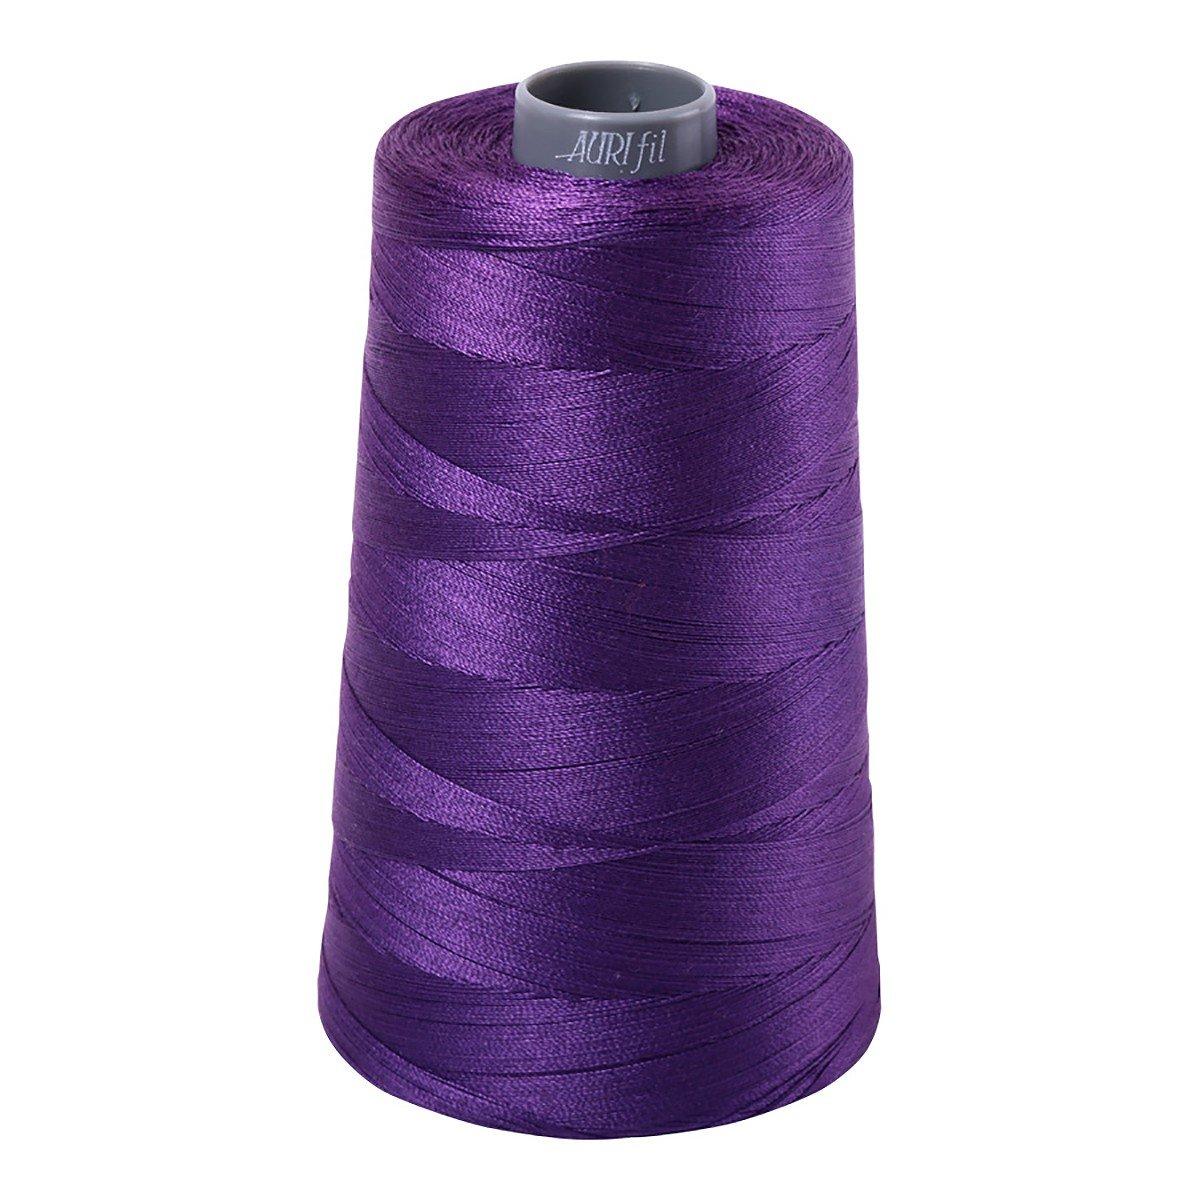 Mako (Cotton) Embroidery Thread 28wt 3609yds Dark Violet